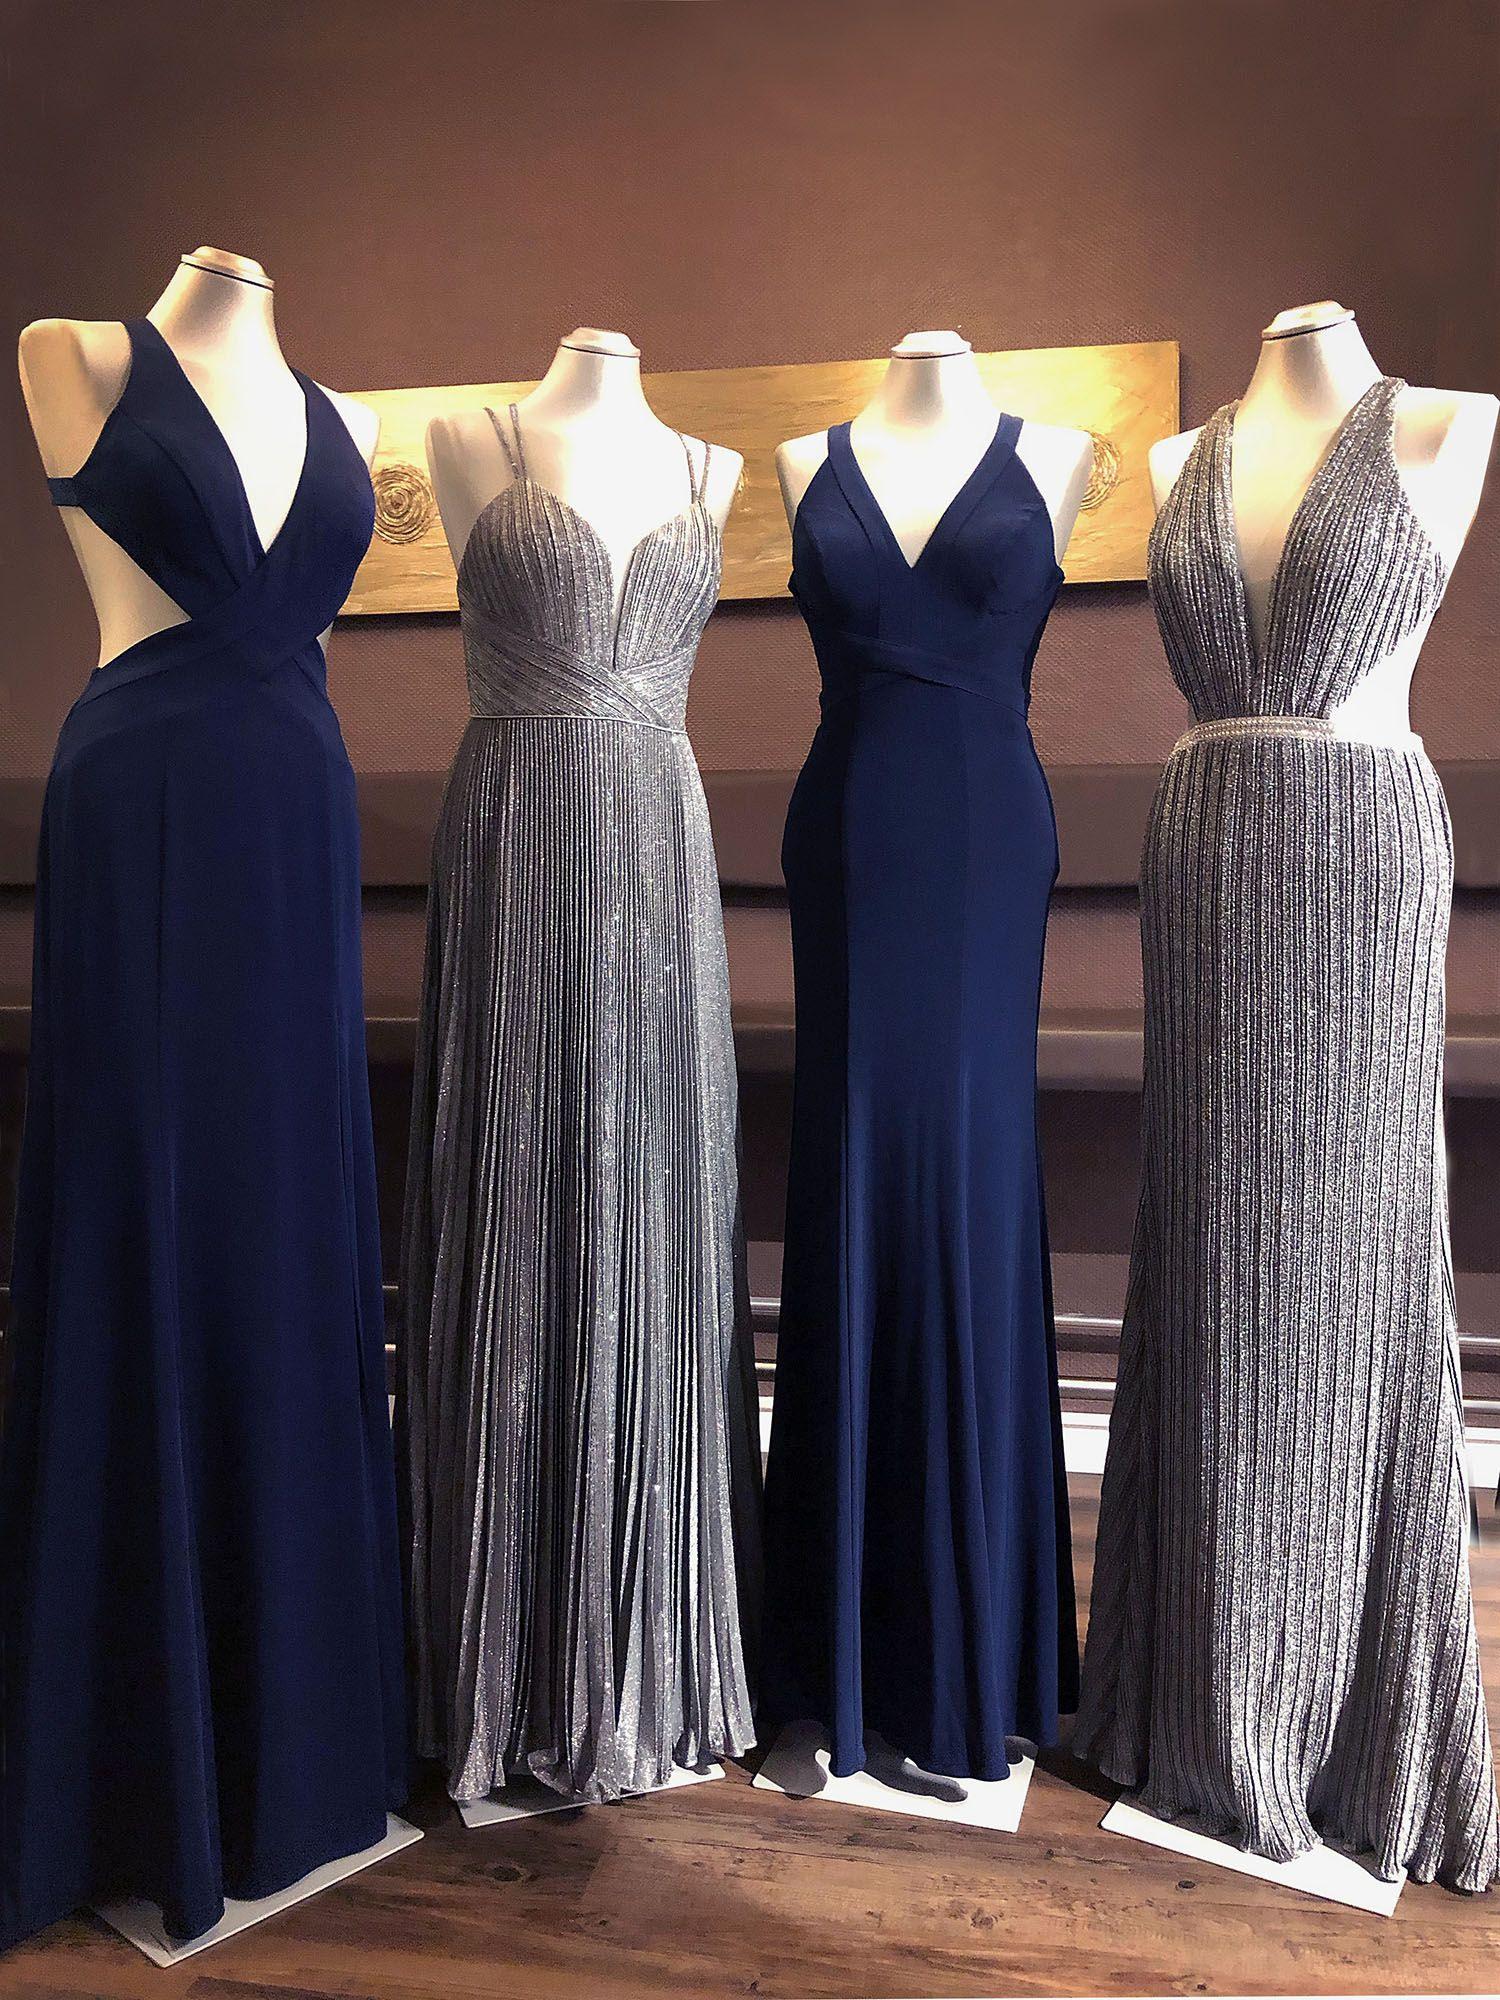 13 Elegant Abendkleider Figurbetont Boutique Coolste Abendkleider Figurbetont Spezialgebiet